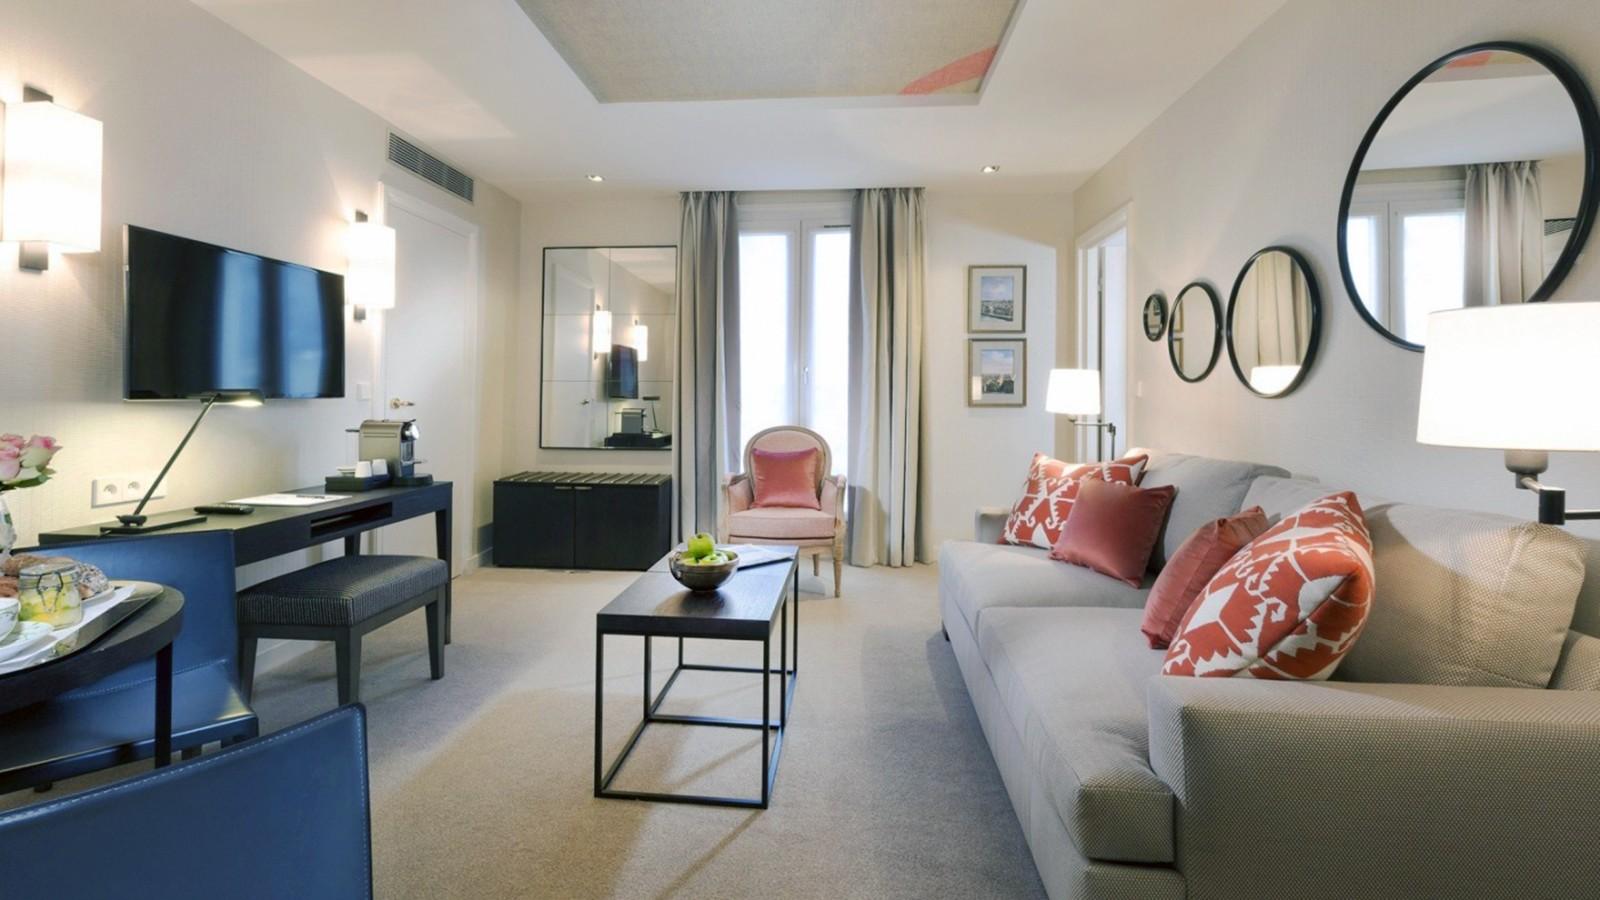 EFI Design Hotel Balmoral Paris Efi Design (3) 1174